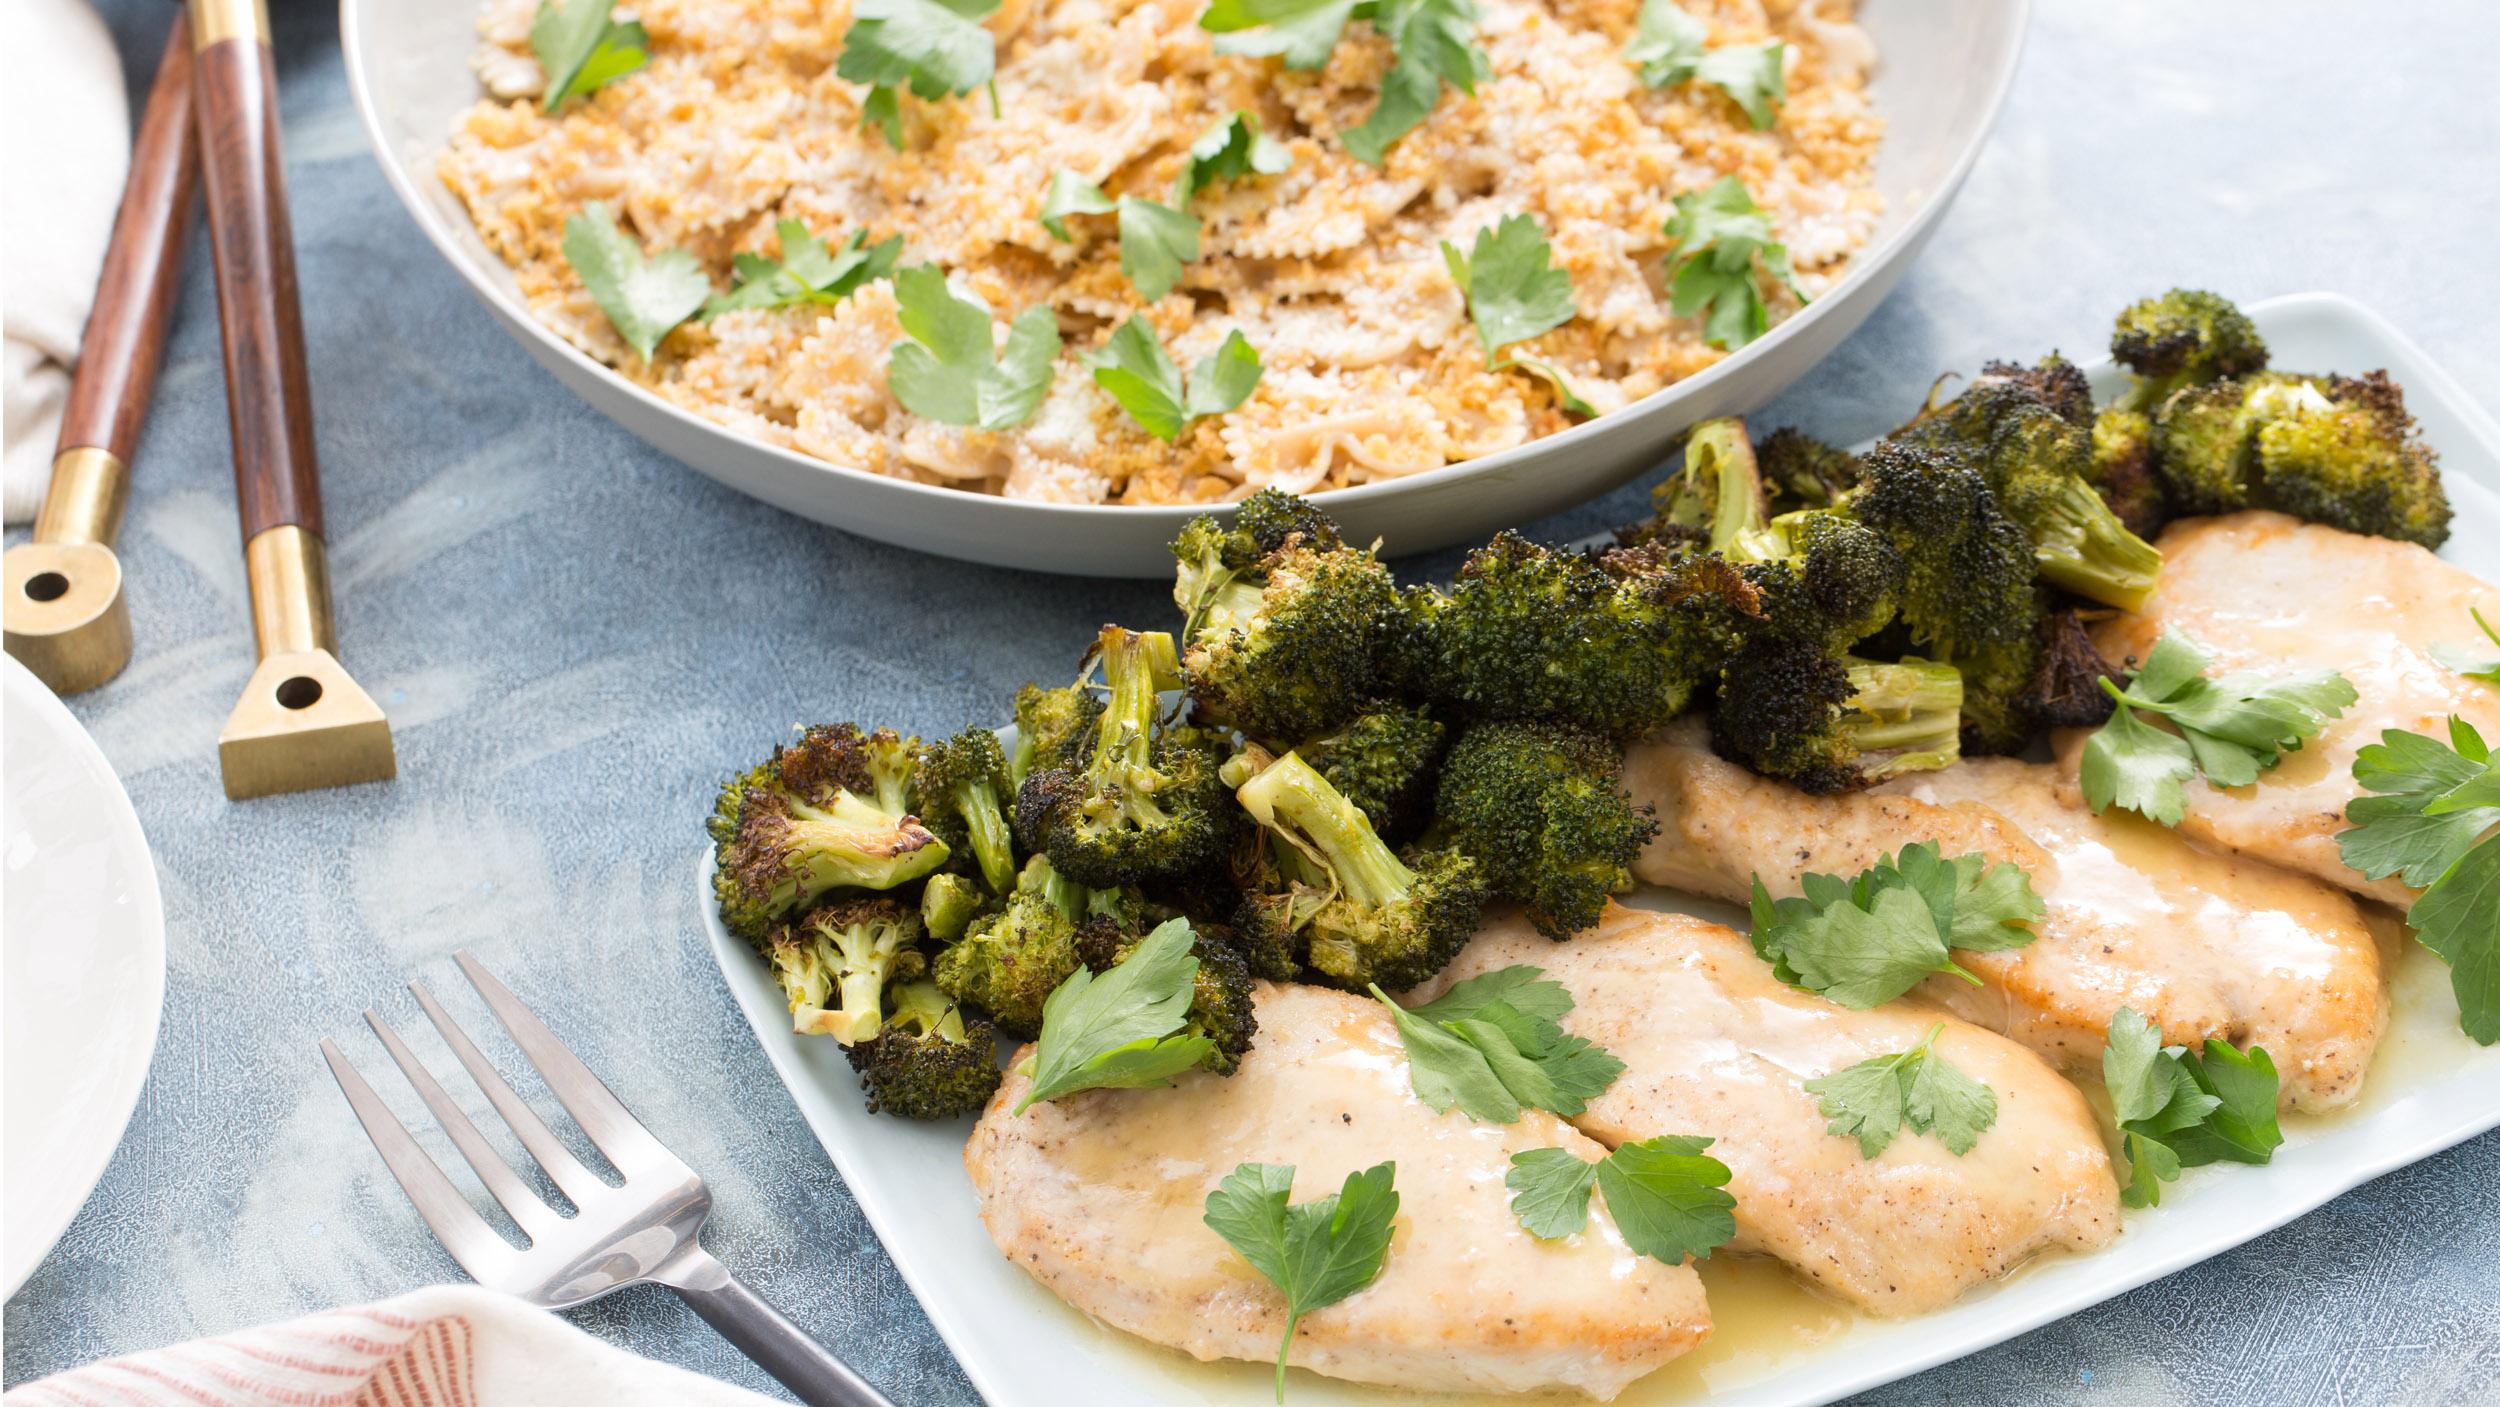 Blue apron broccoli - Blue Apron Broccoli 78